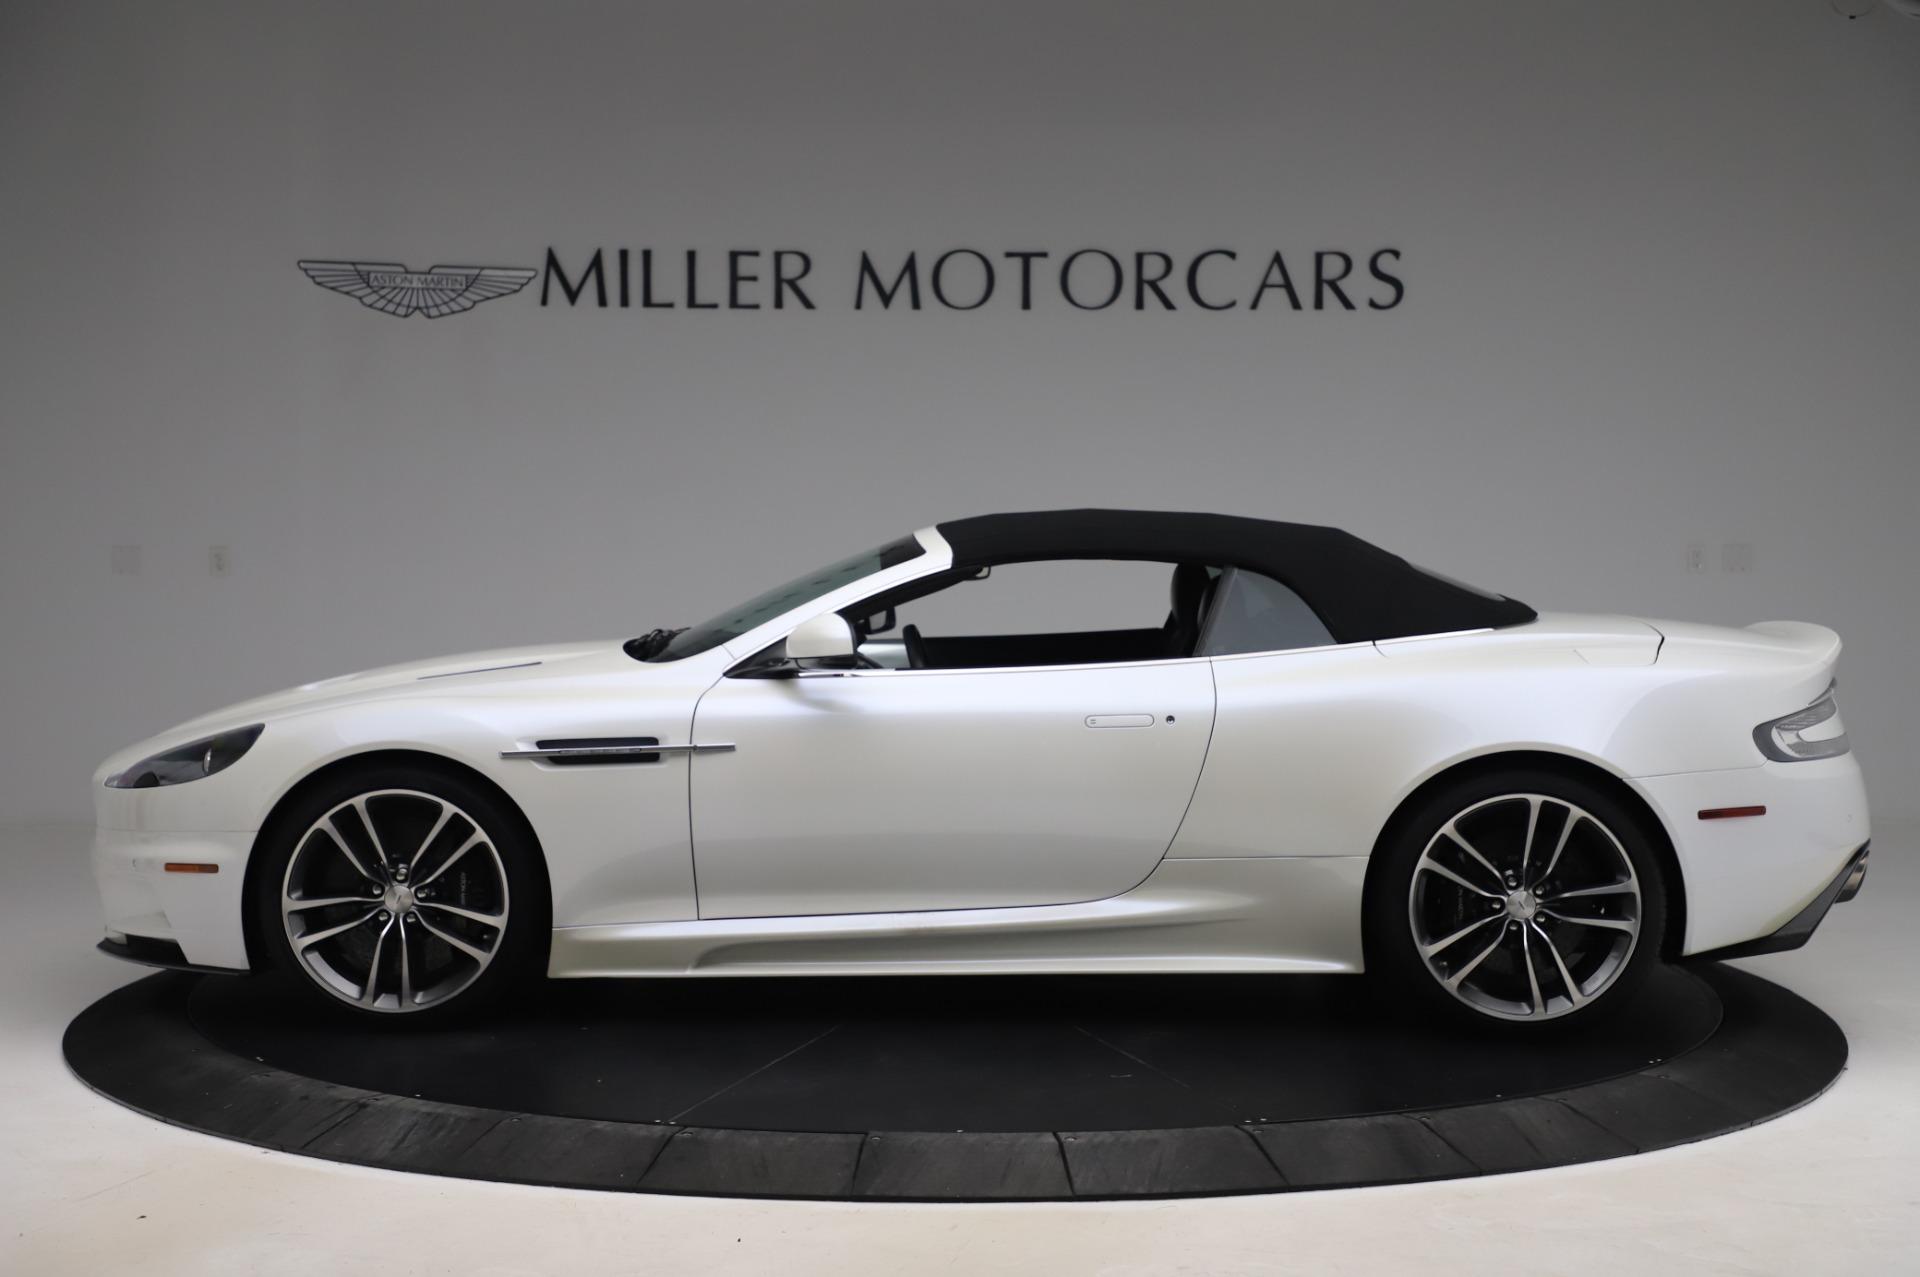 Used 2010 Aston Martin DBS Volante